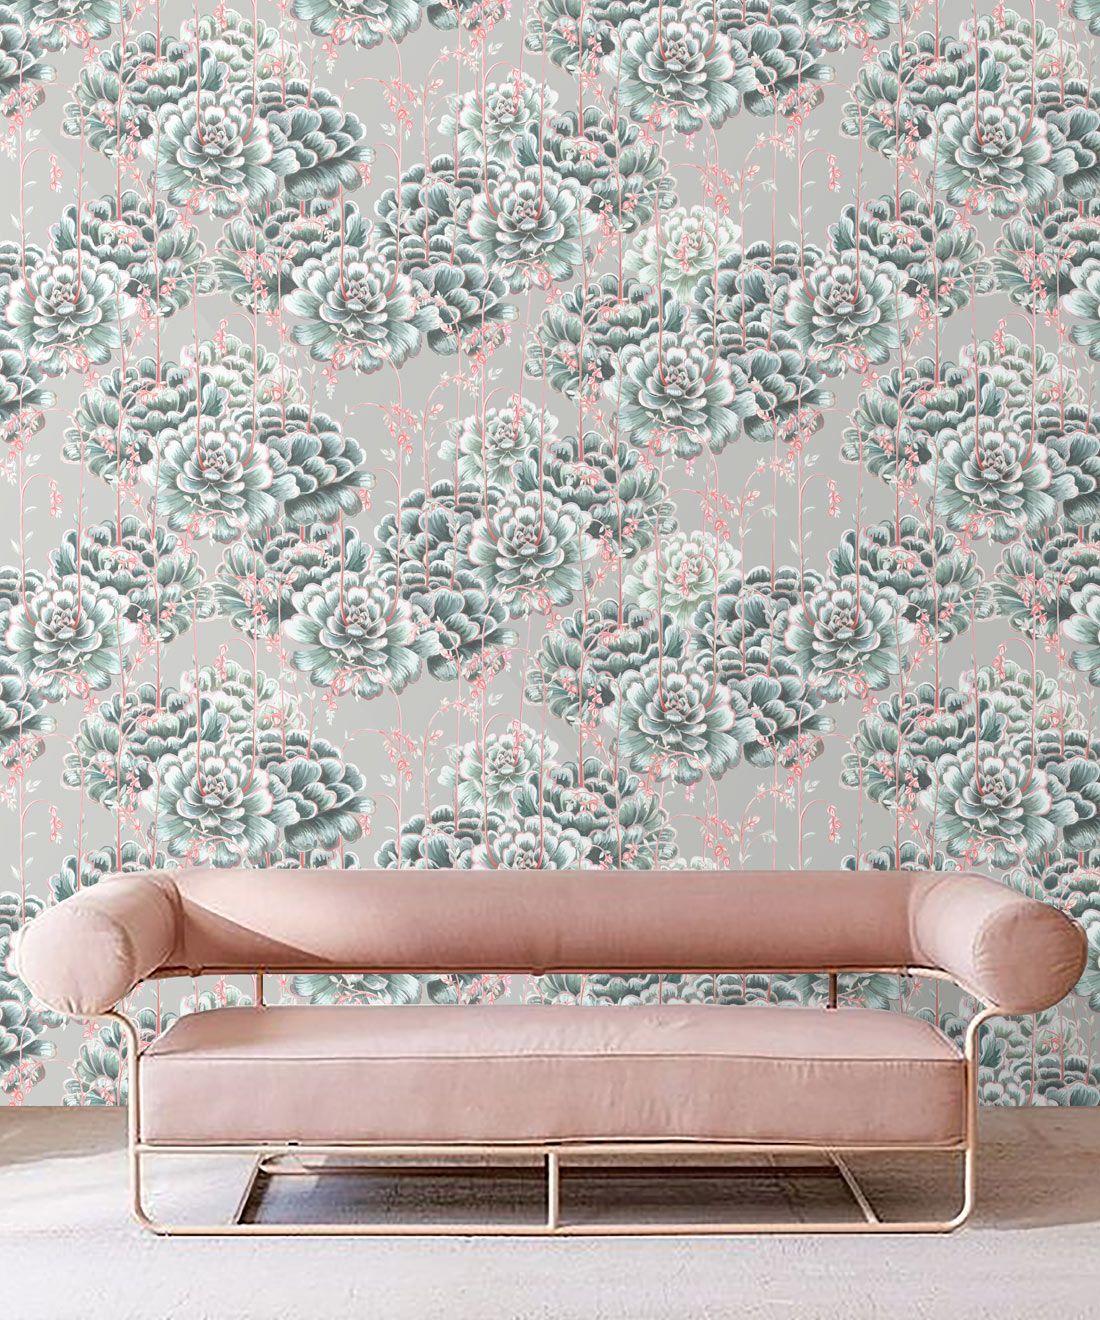 Succulents Wallpaper Sage • Cactus Wallpaper • Desert Wallpaper insitu on grey background behind pink sofa